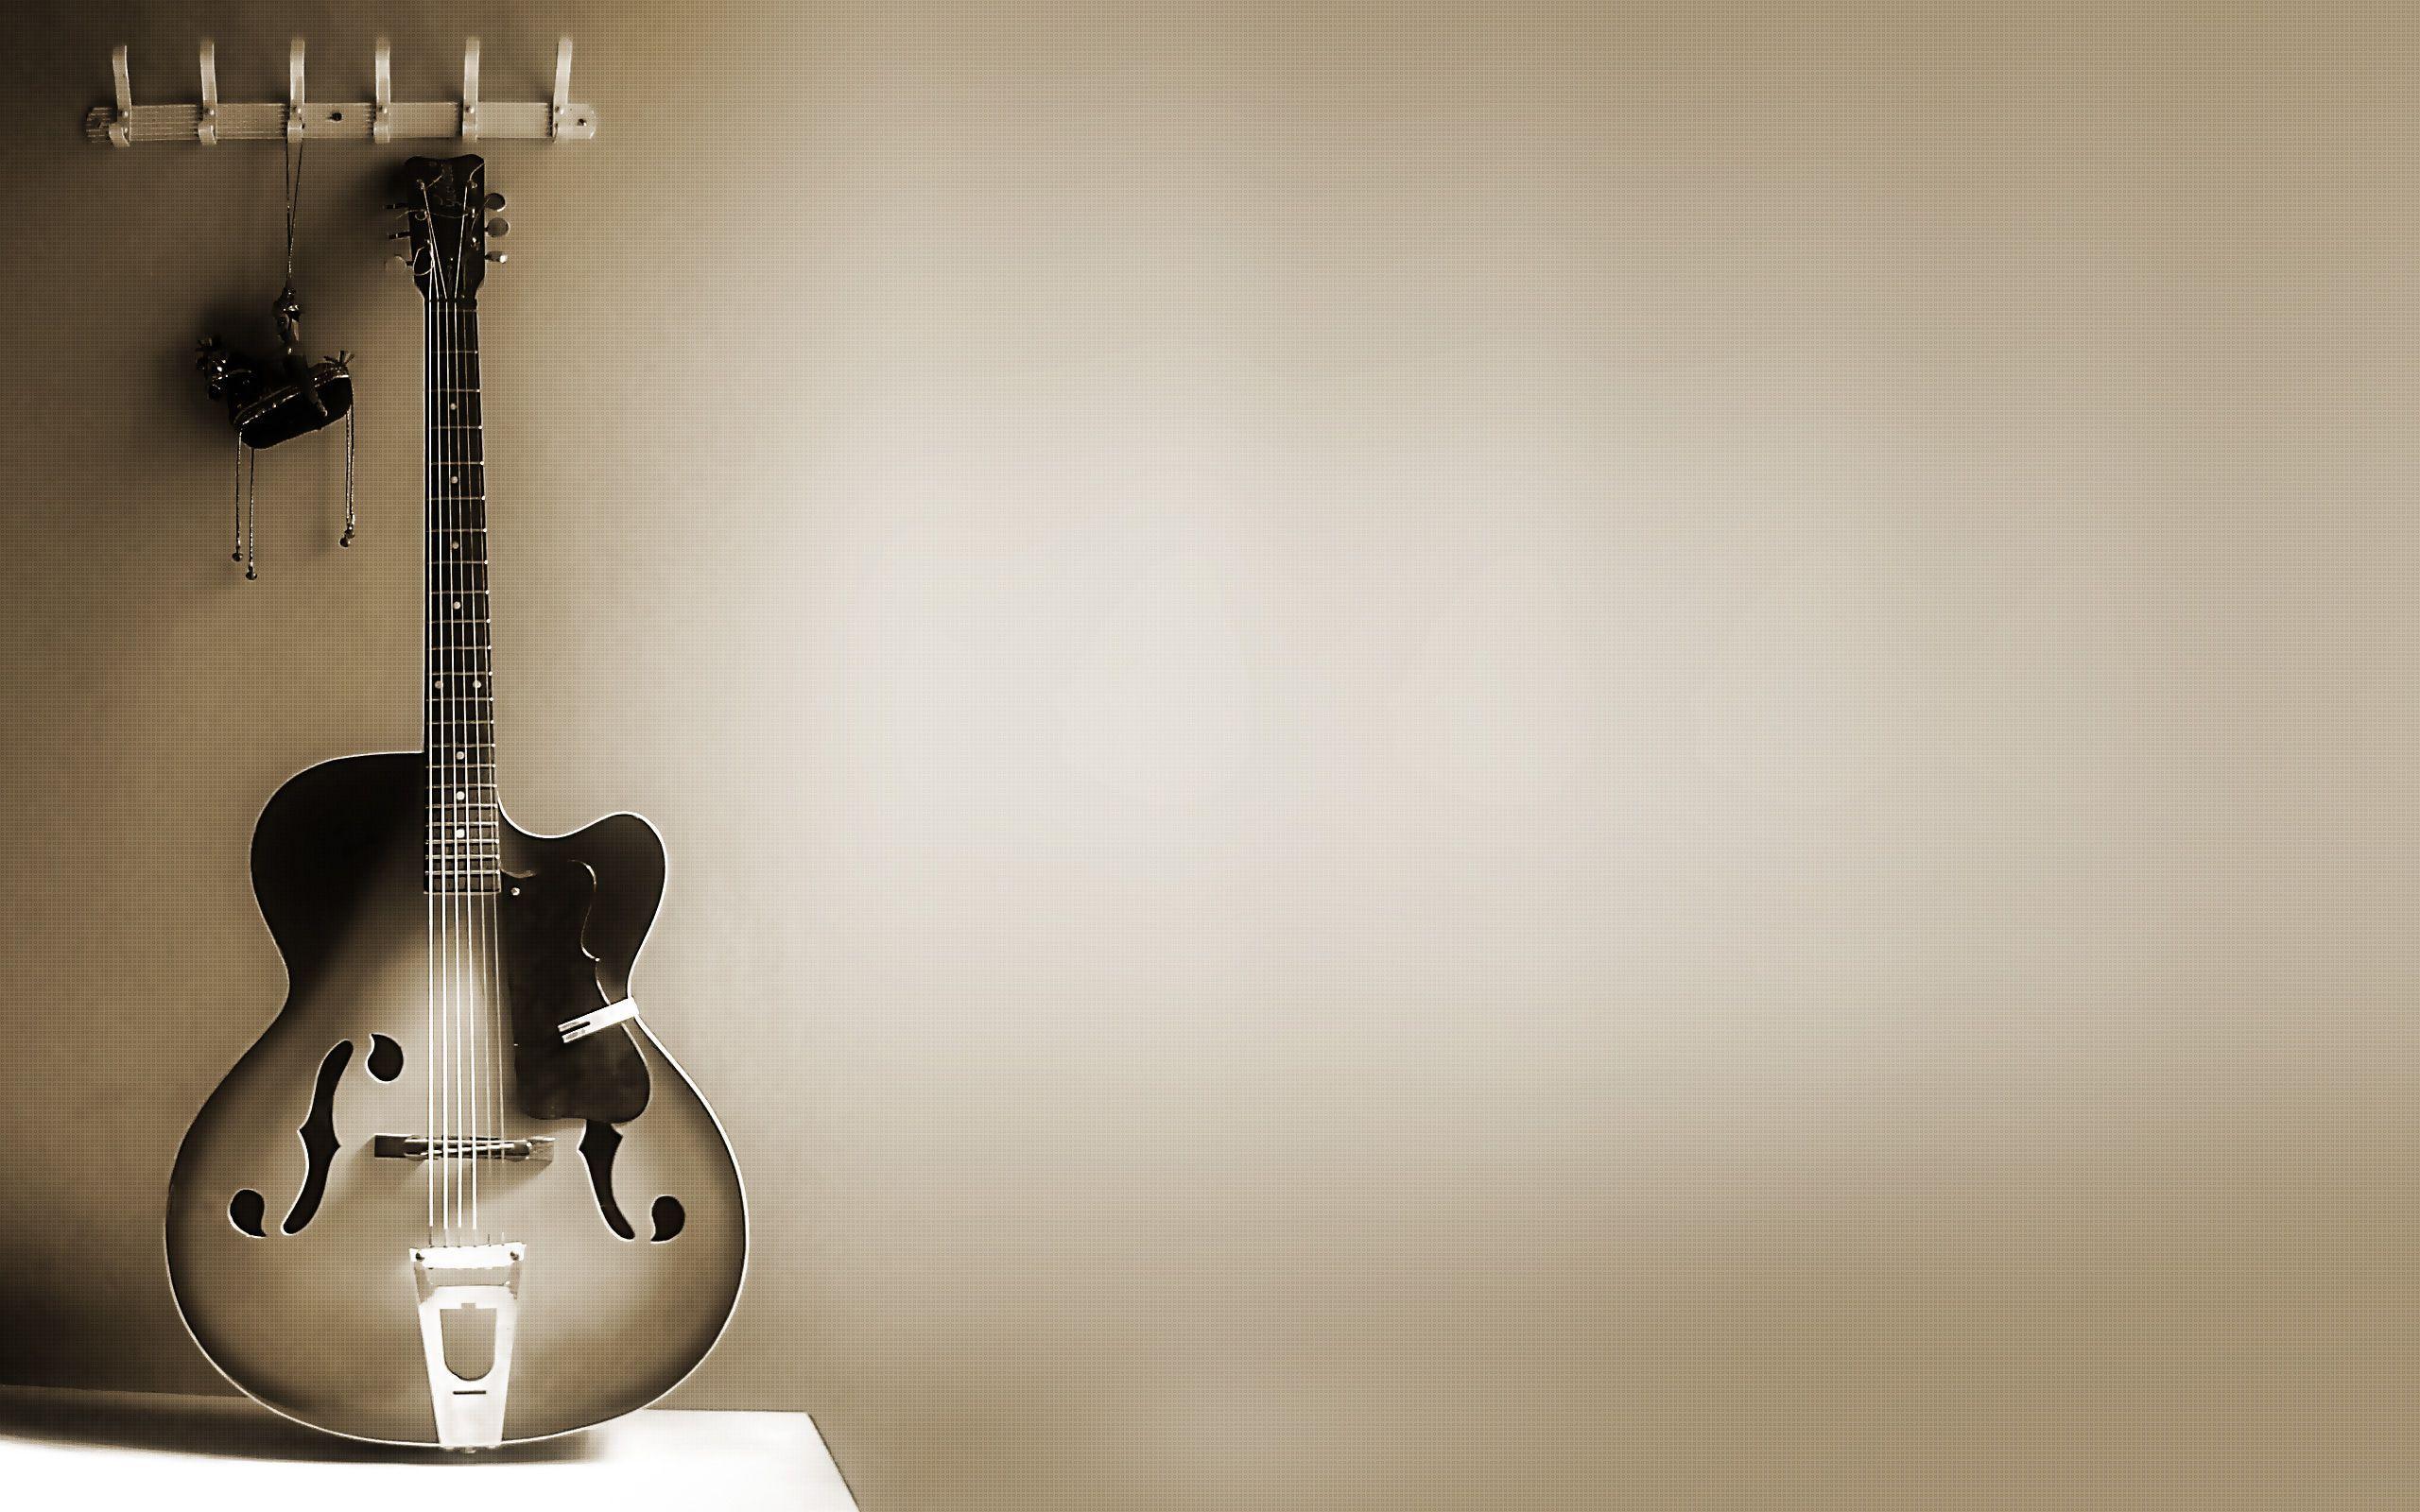 Guitar Backgrounds Hd Wallpaper Cave